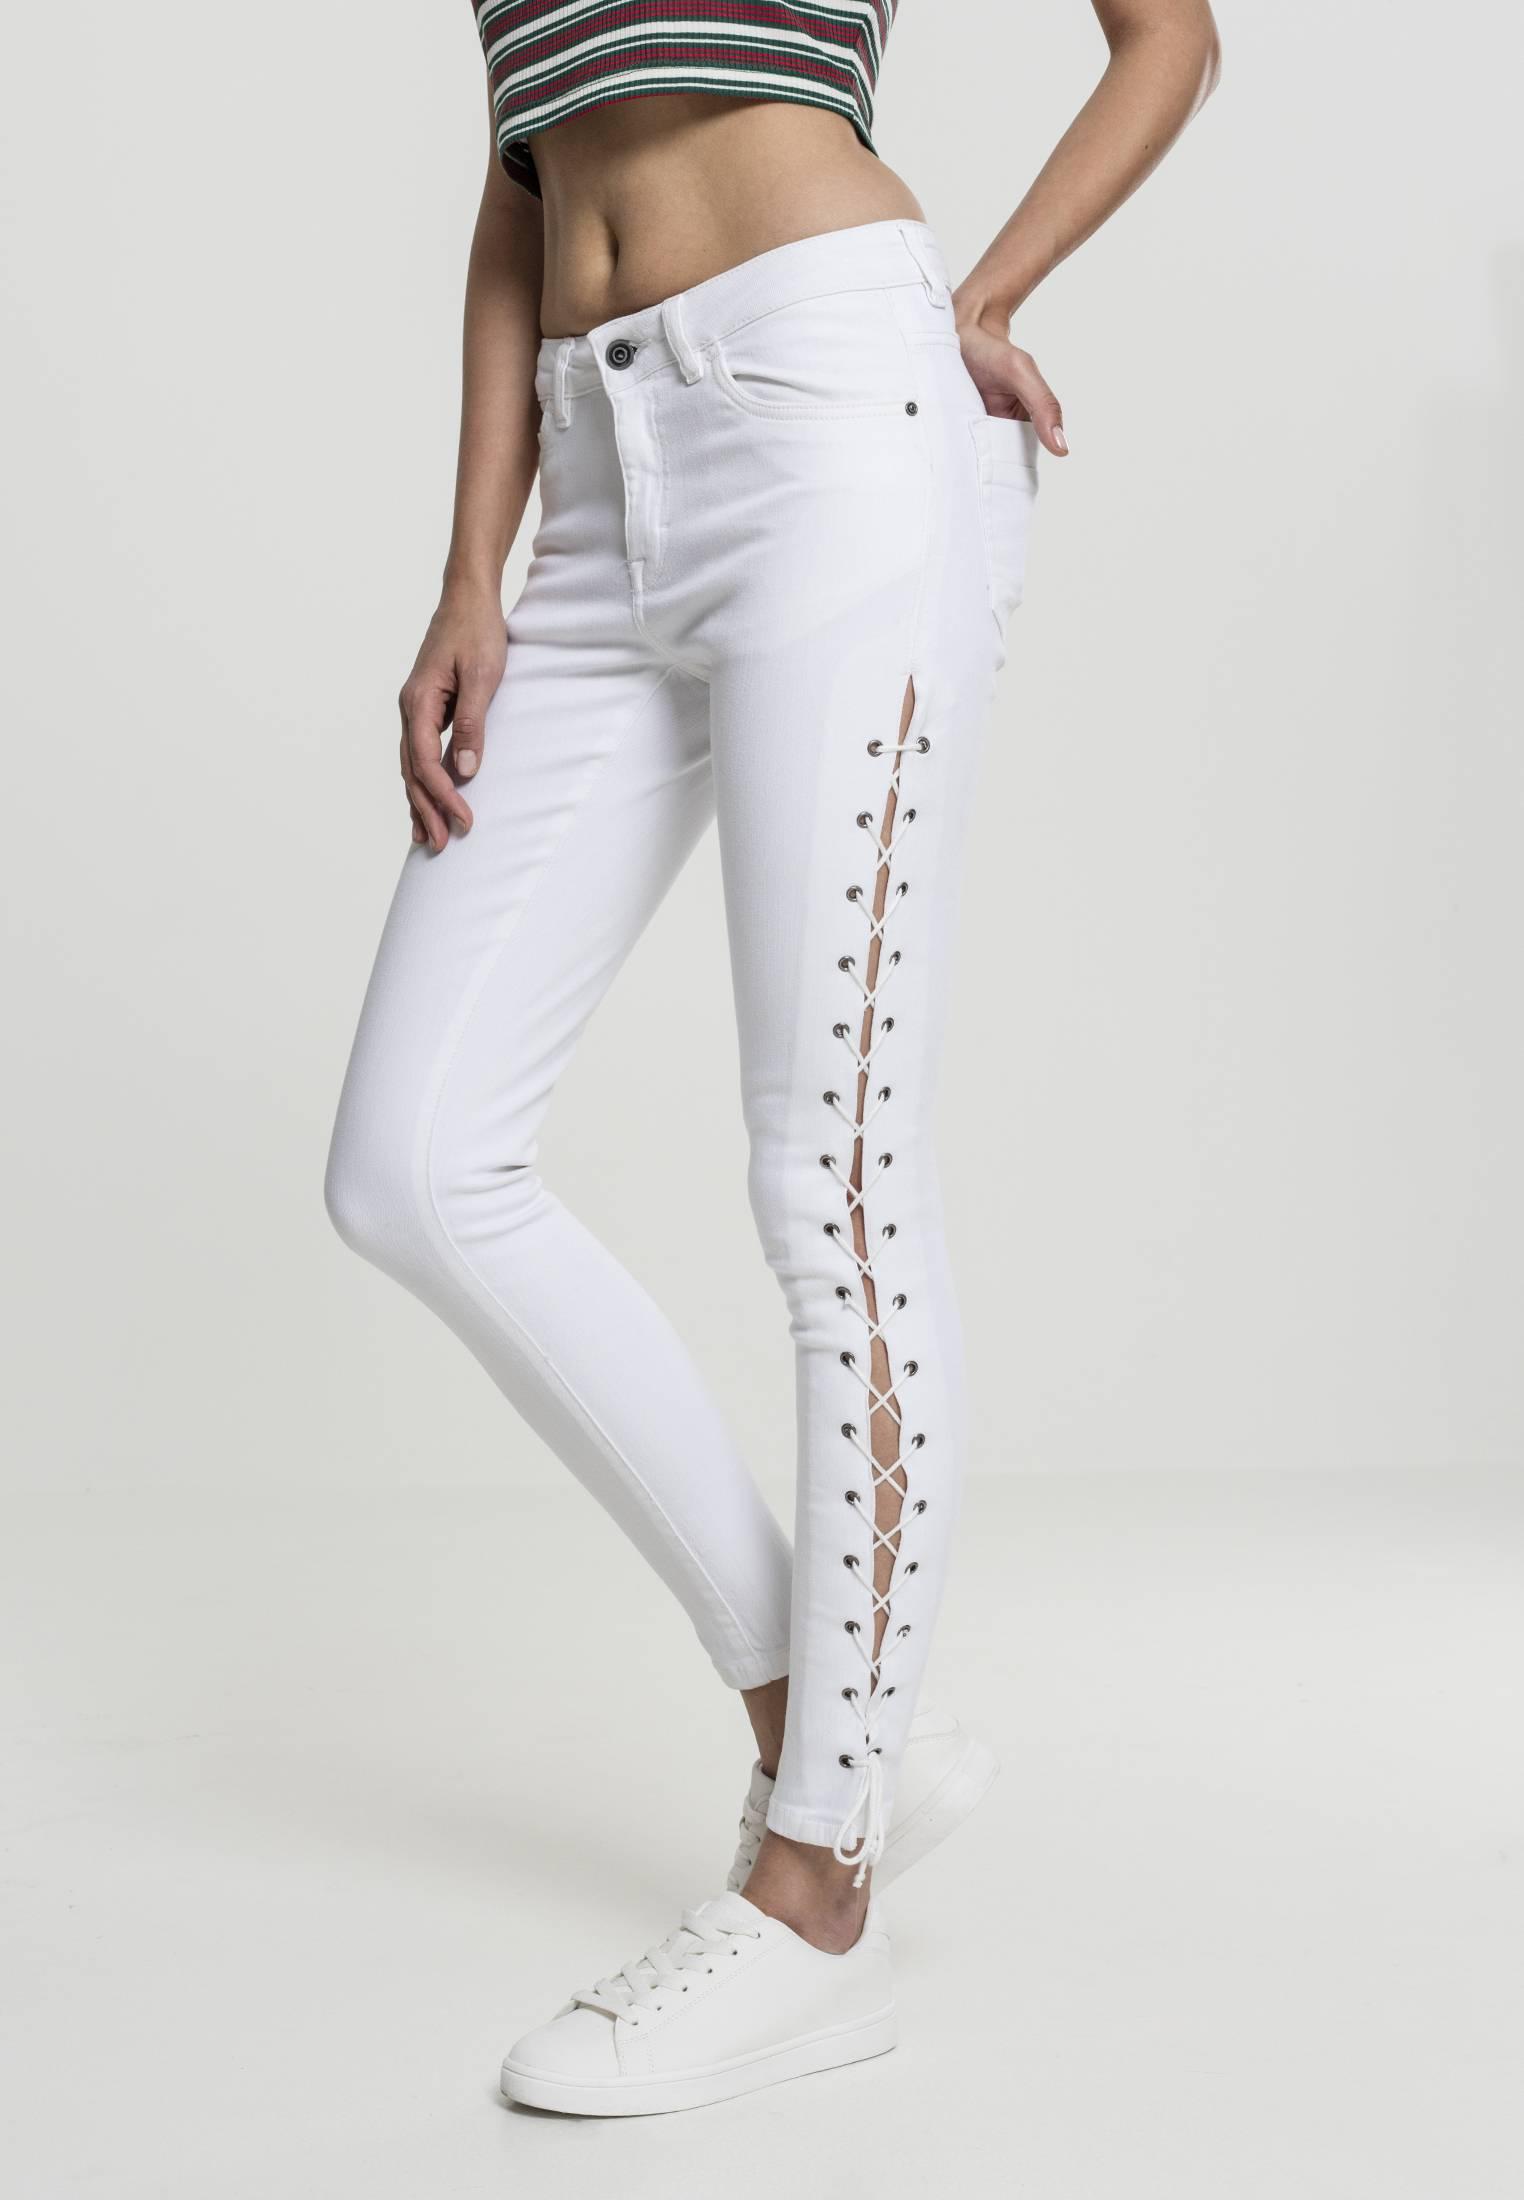 Urban Classics Ladies Denim Lace Up Skinny Pants white - 26